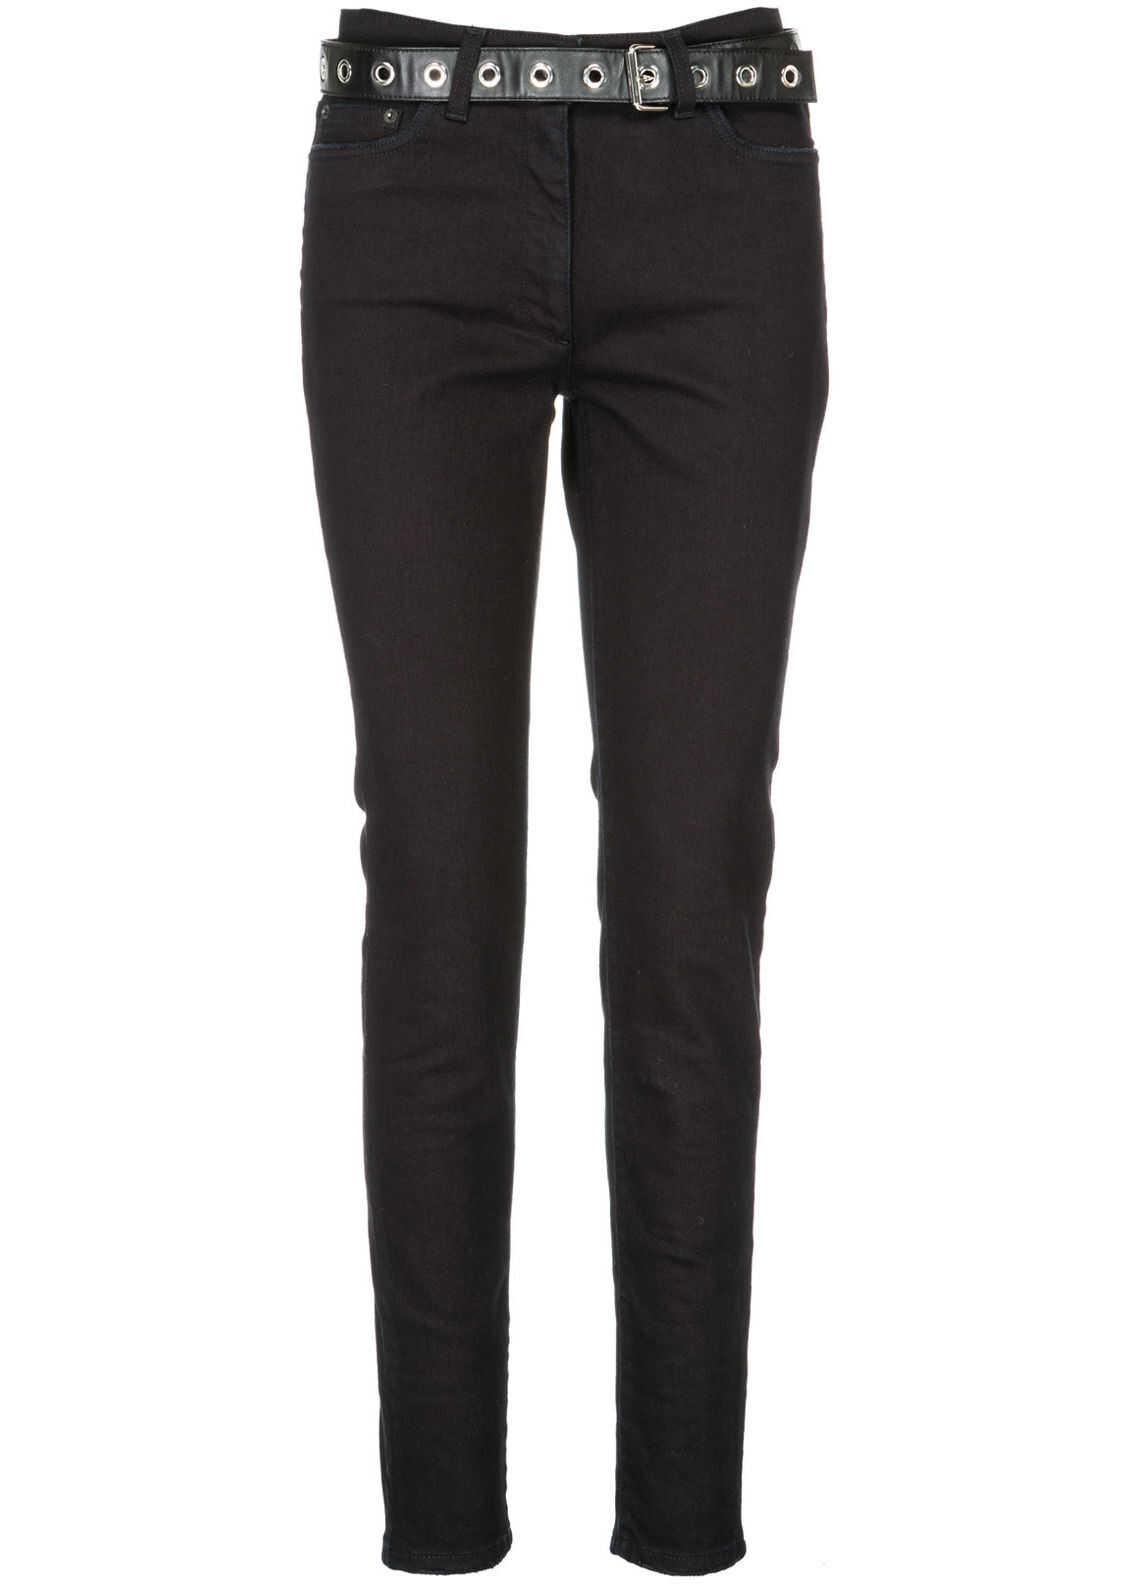 Moschino Skinny Jeans Black